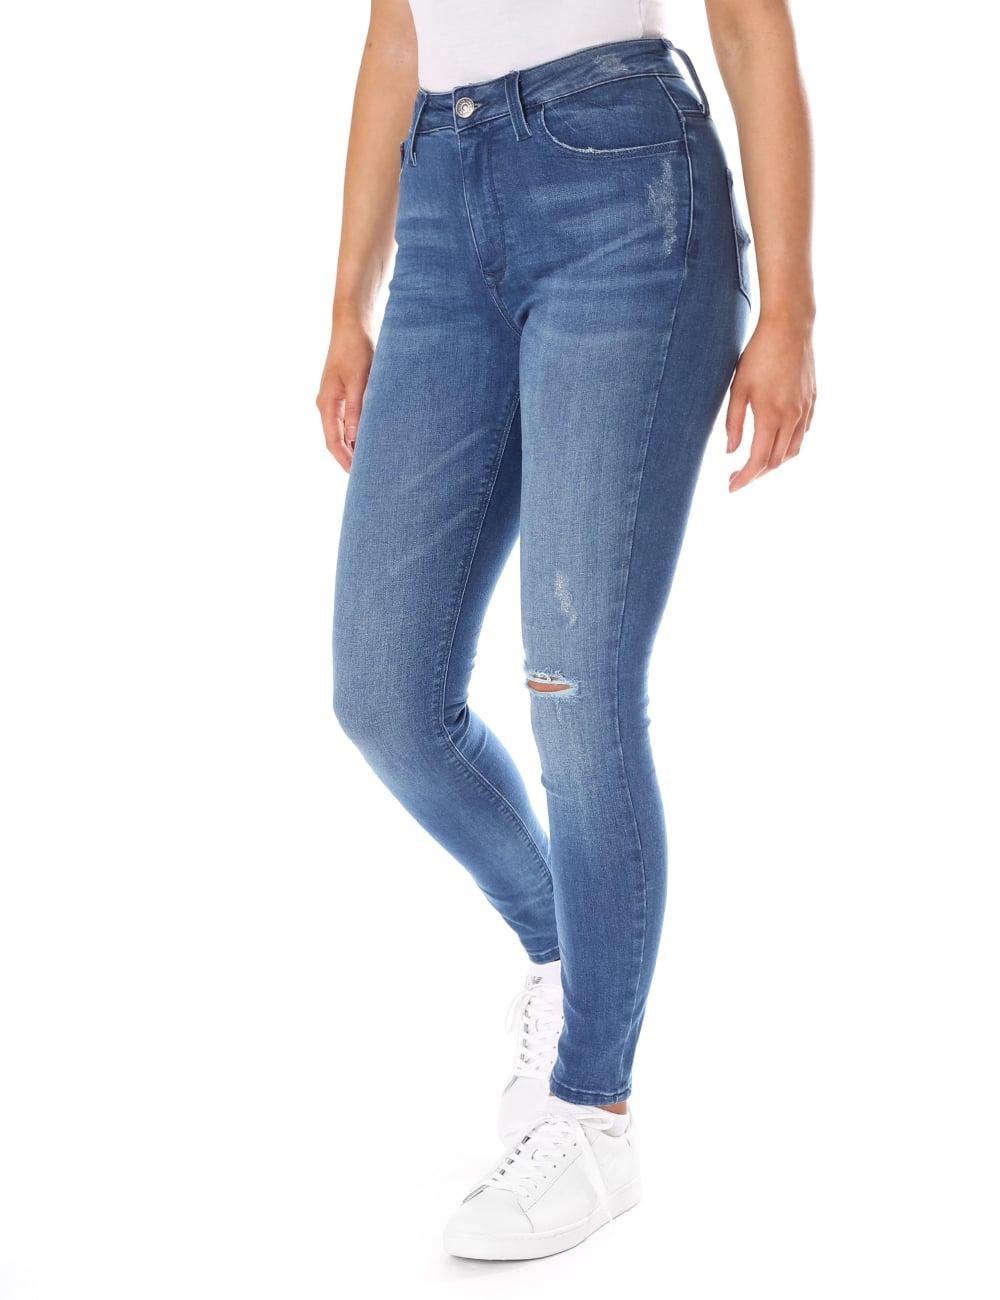 2ec19a8f Tommy Hilfiger Women's High Rise Skinny Santana Jean